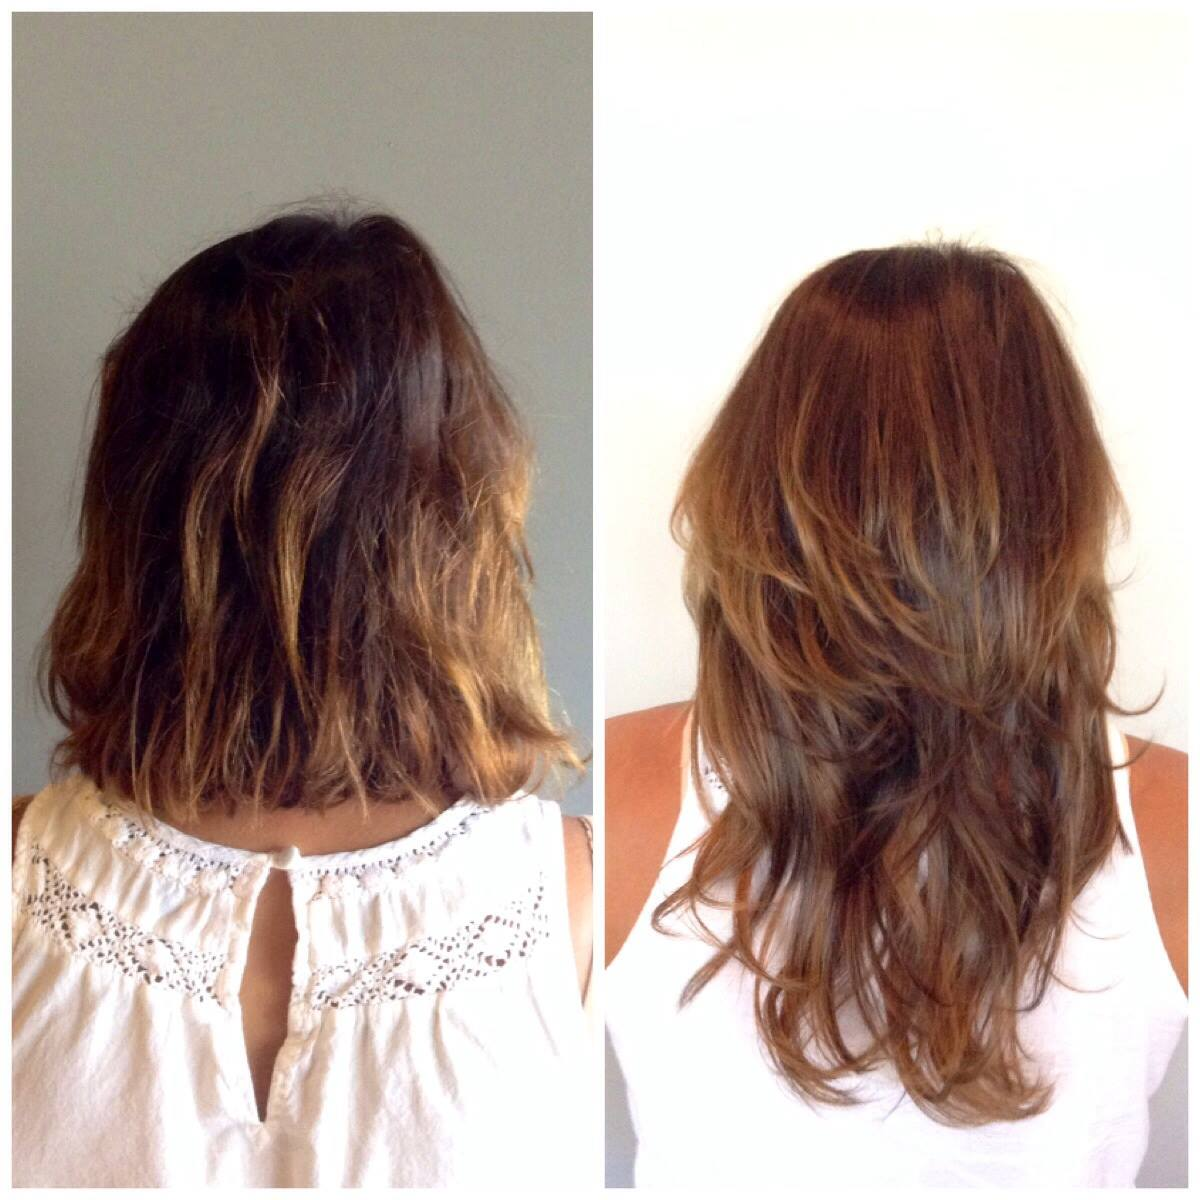 Vomor Hair Extensions Coming Soon Cv Hair Company Lake Mills Wi